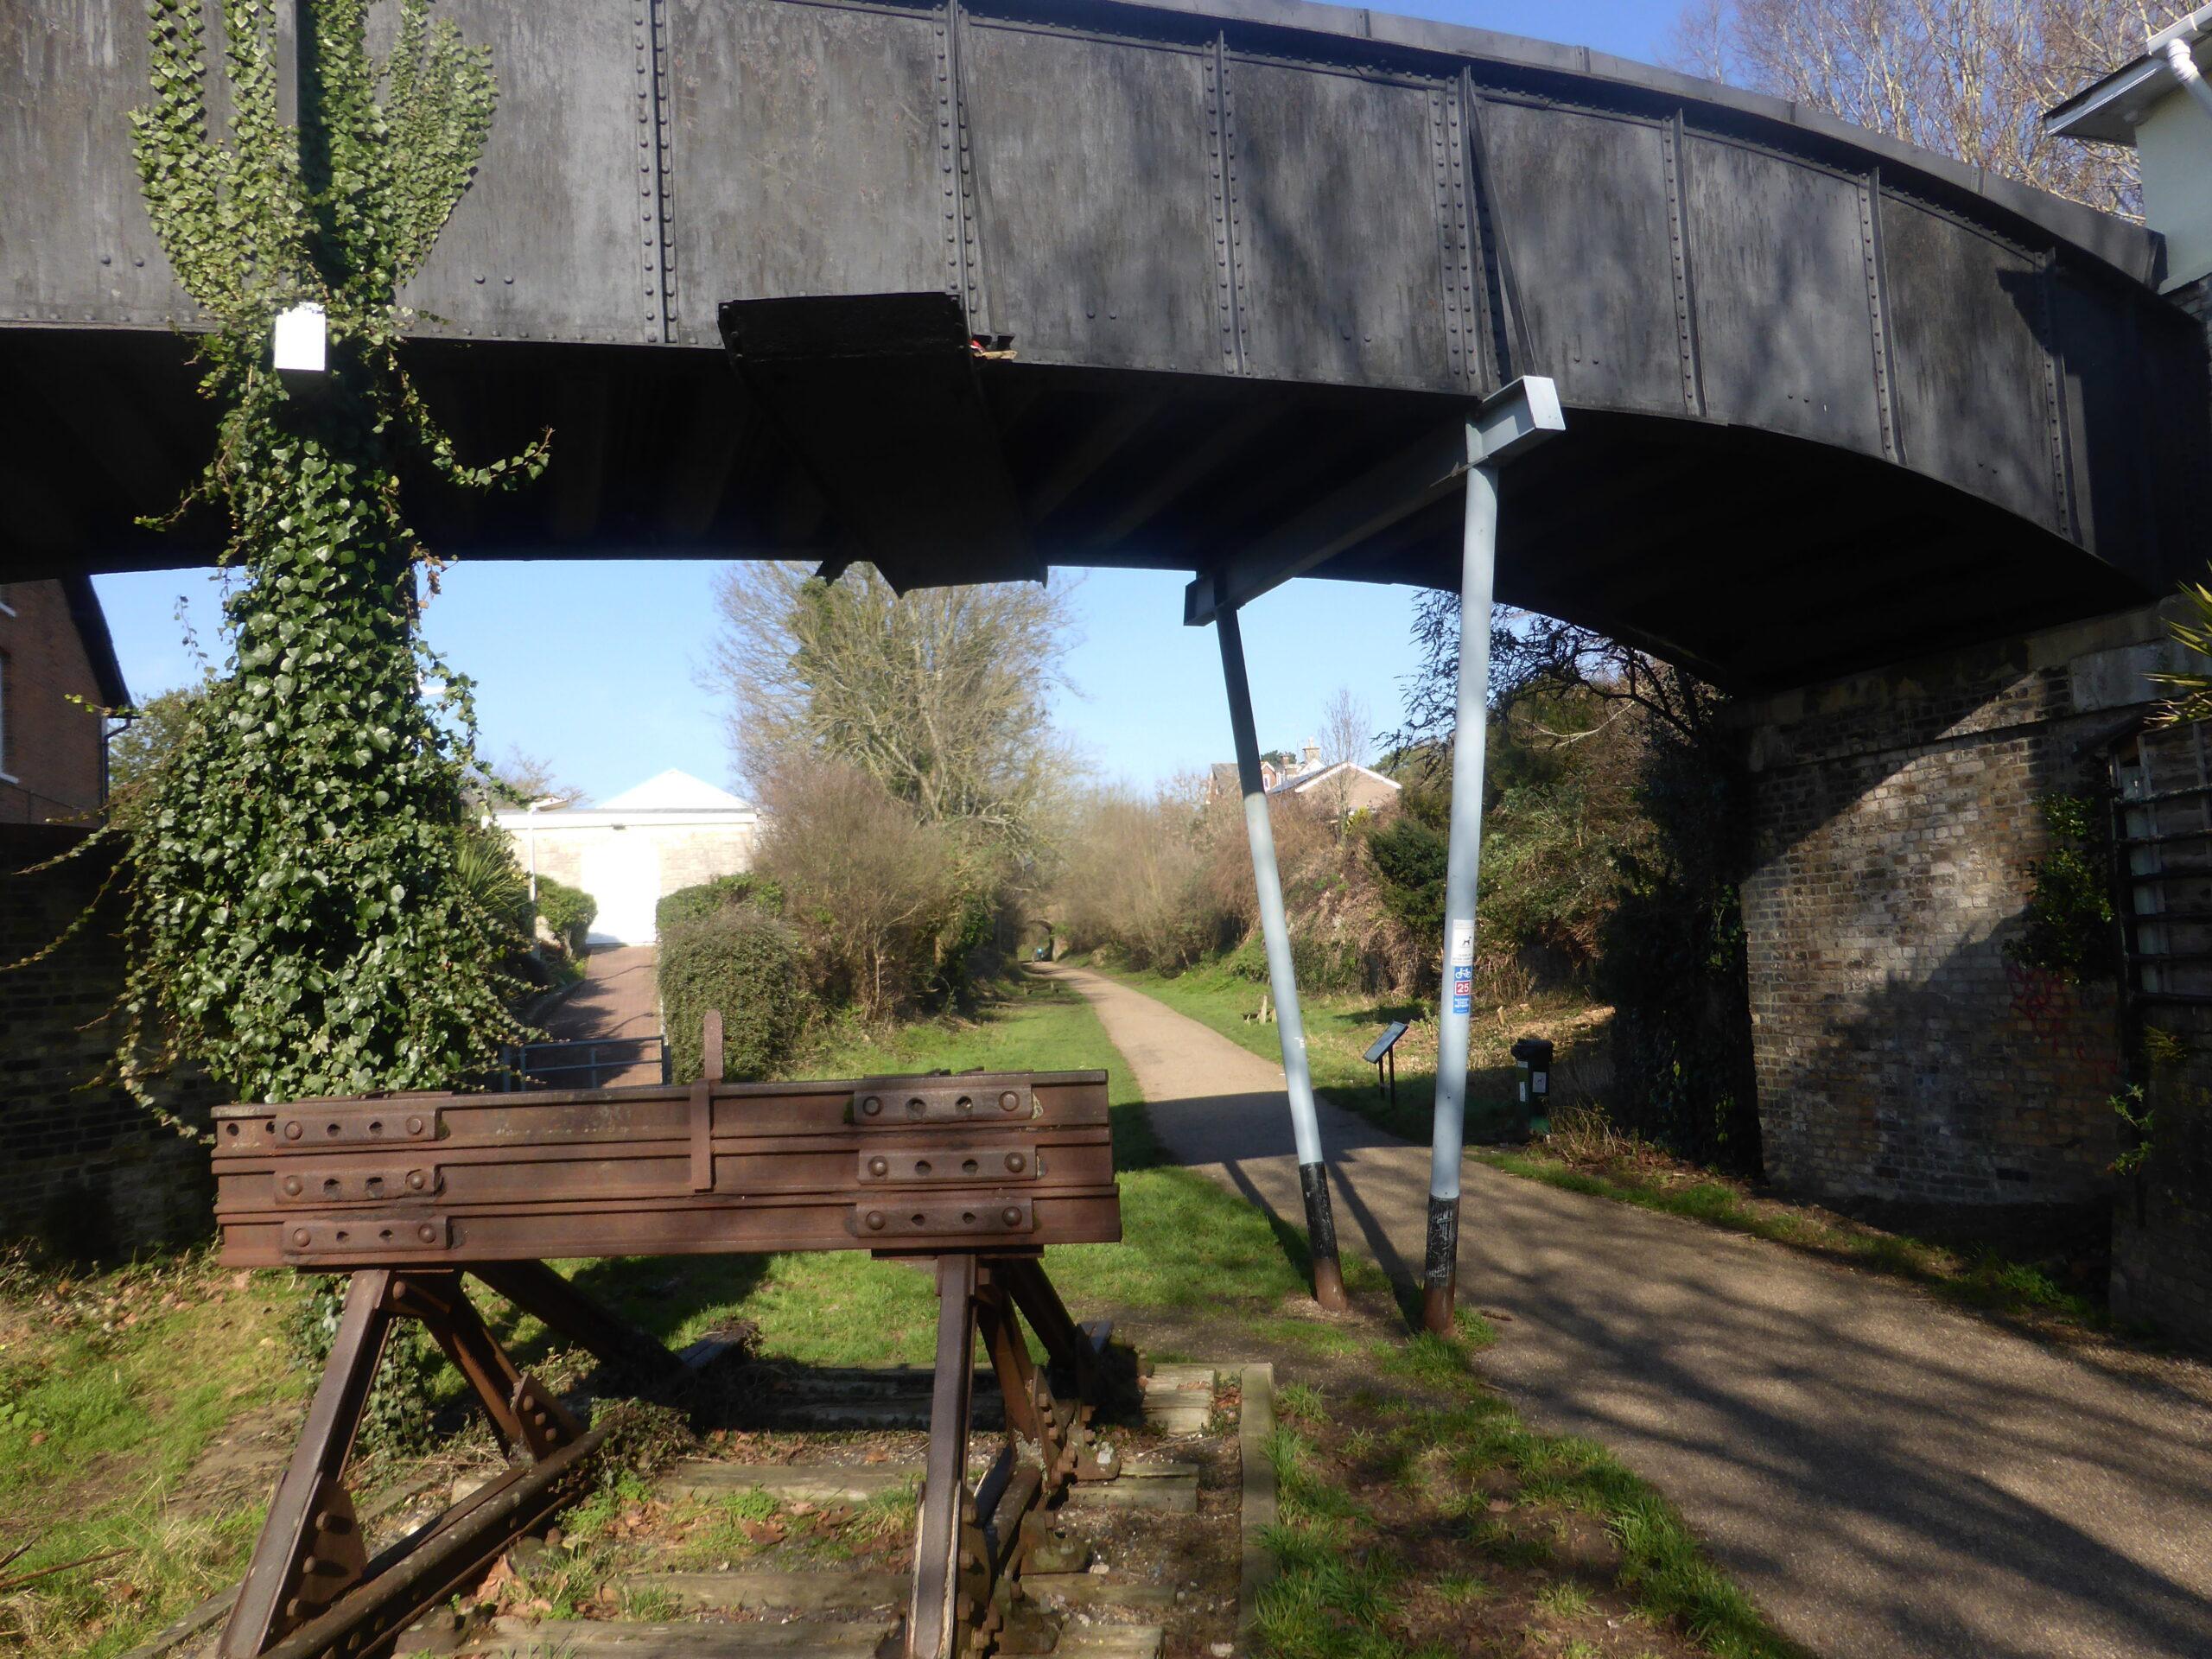 North Dorset Trailway at Blandford Forum | Blandford Forum